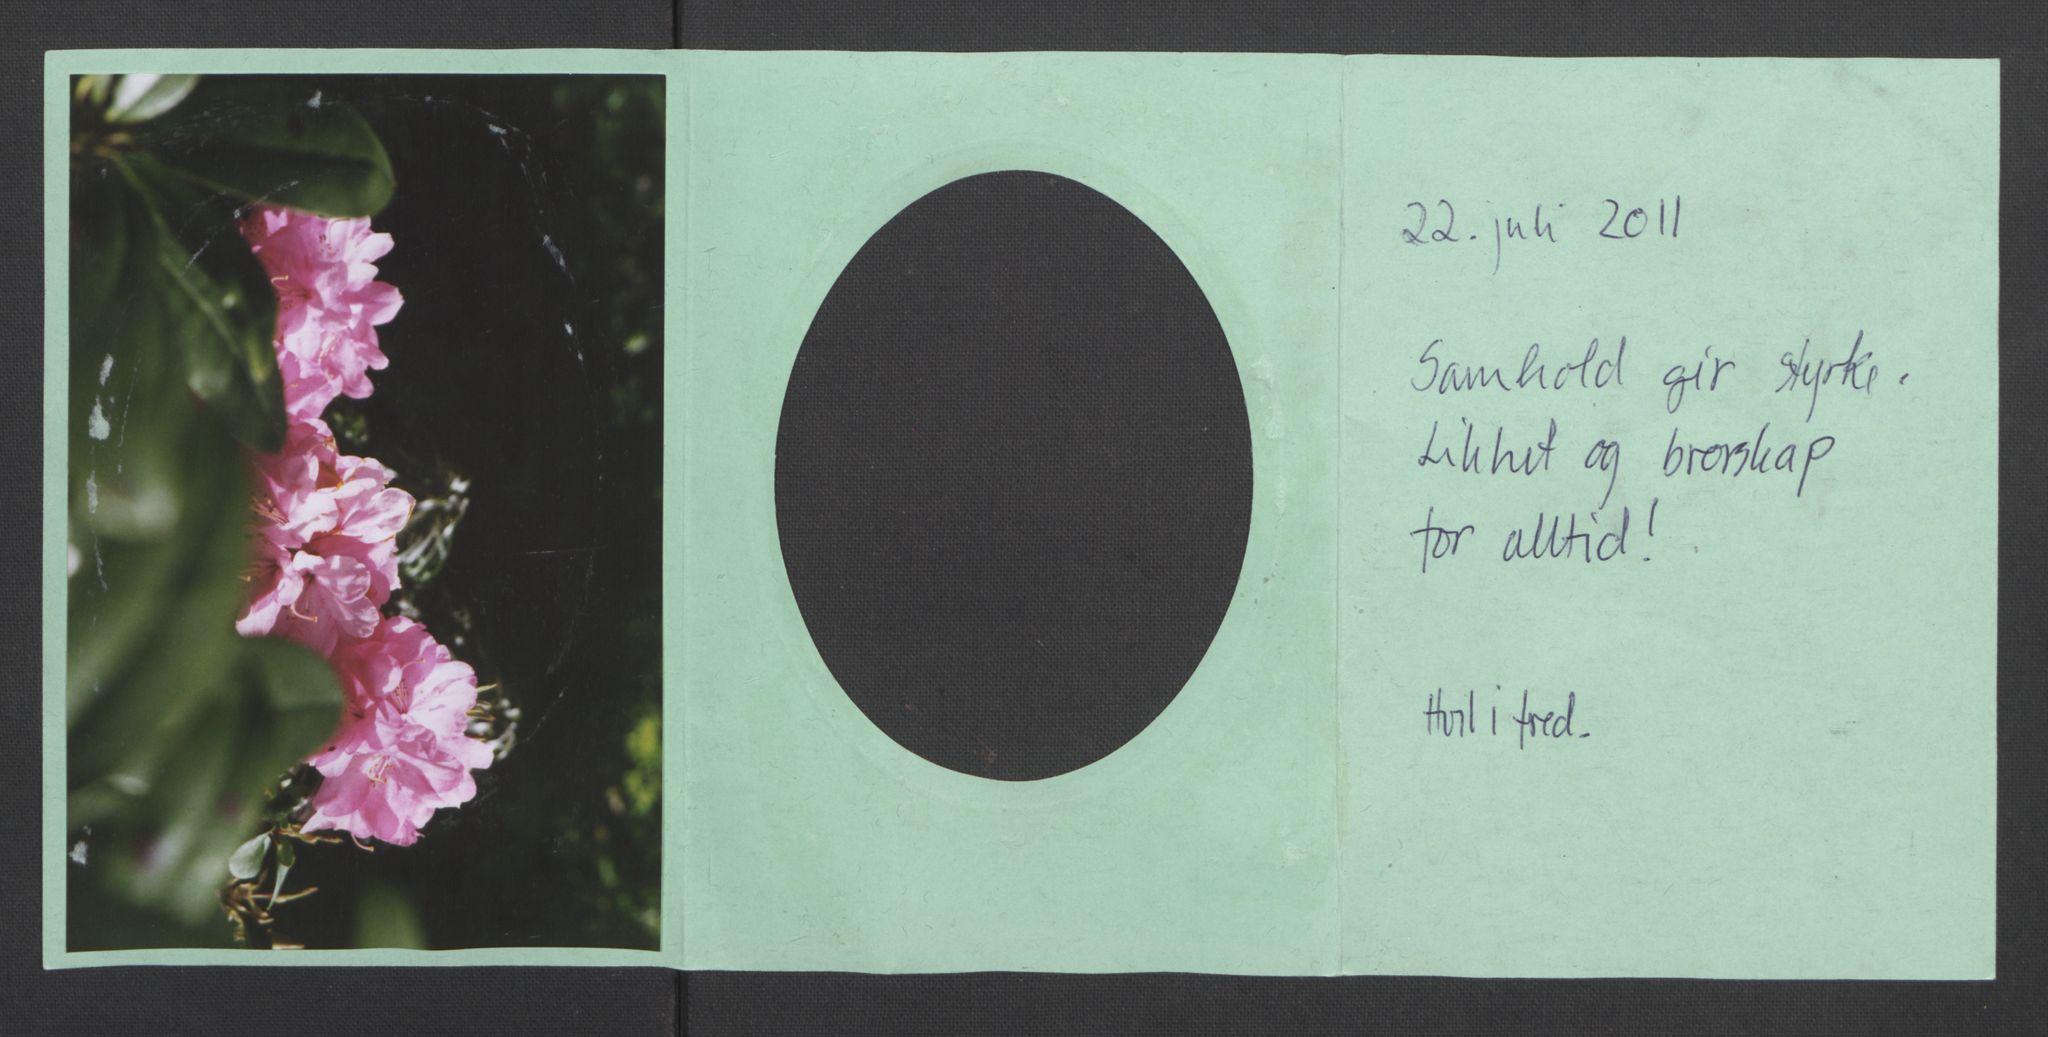 RA, Minnemateriale etter 22.07.2011, 2011, s. 1158